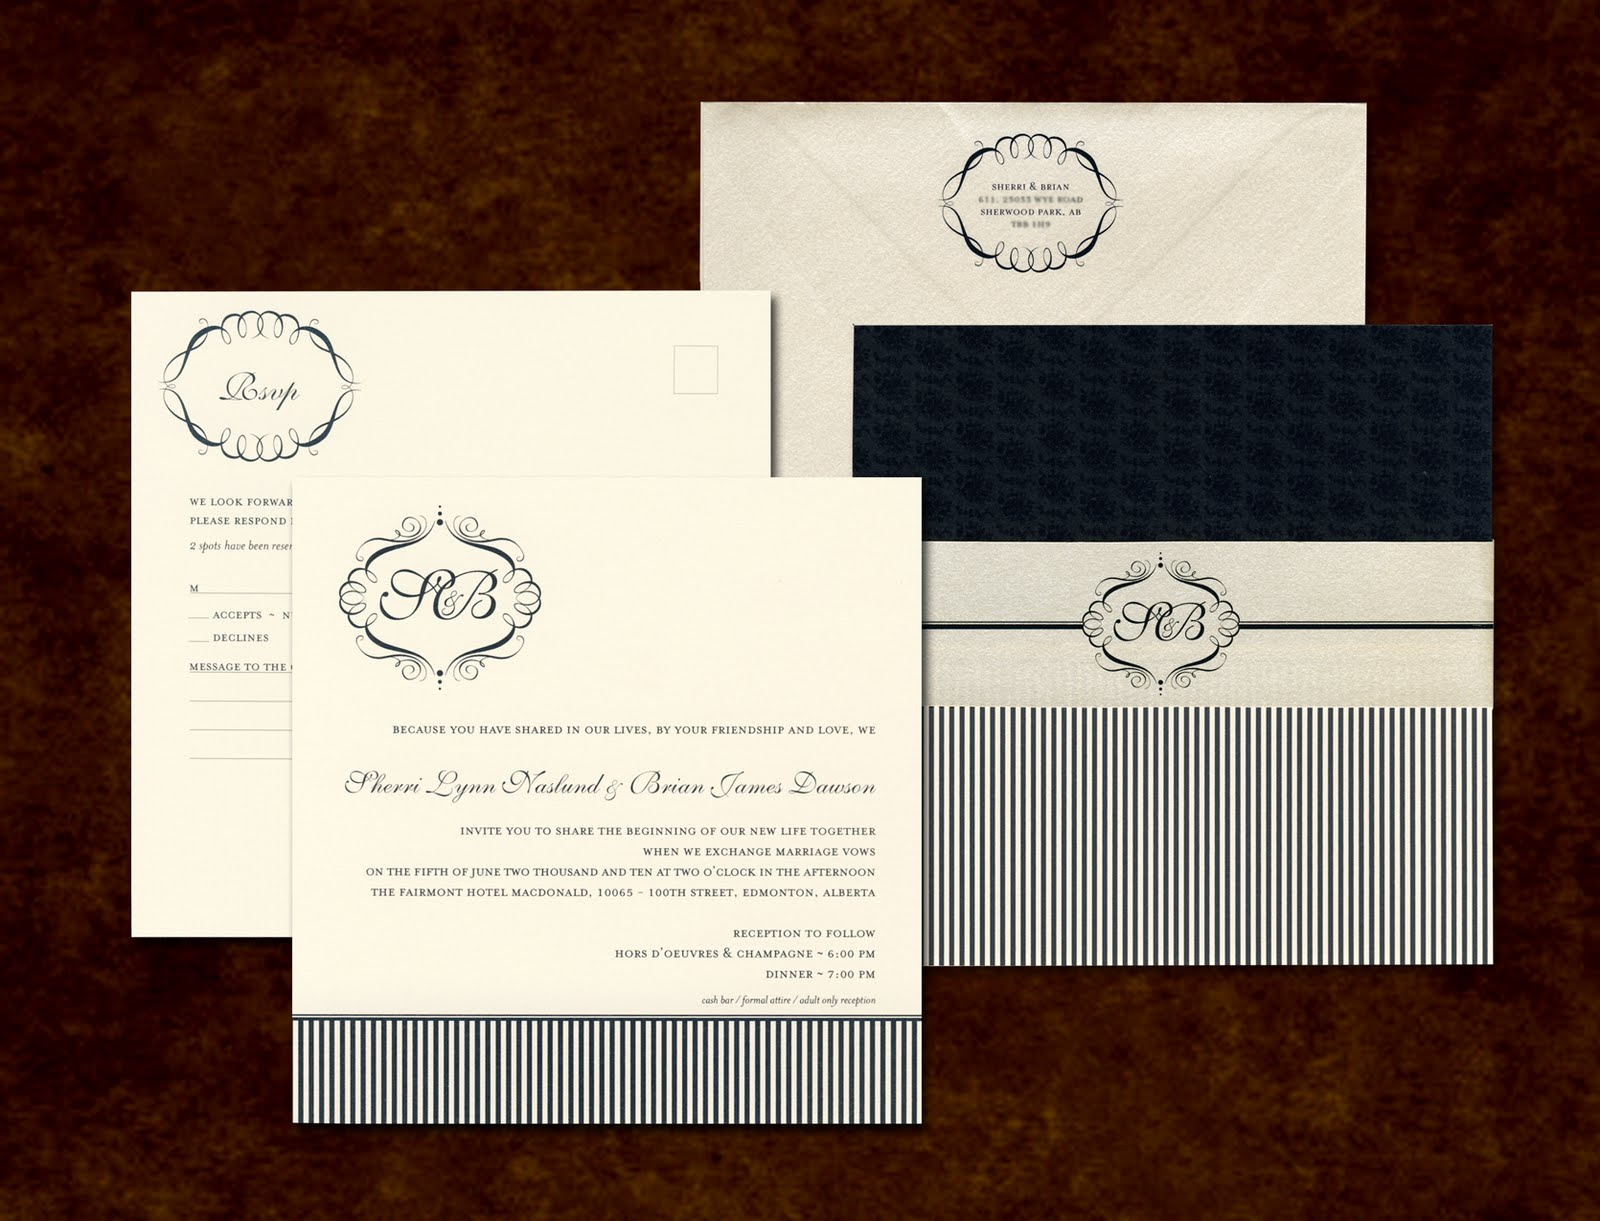 Edmonton Wedding Invitations: It's All Polkadots!: Recent Work :: Edmonton Wedding